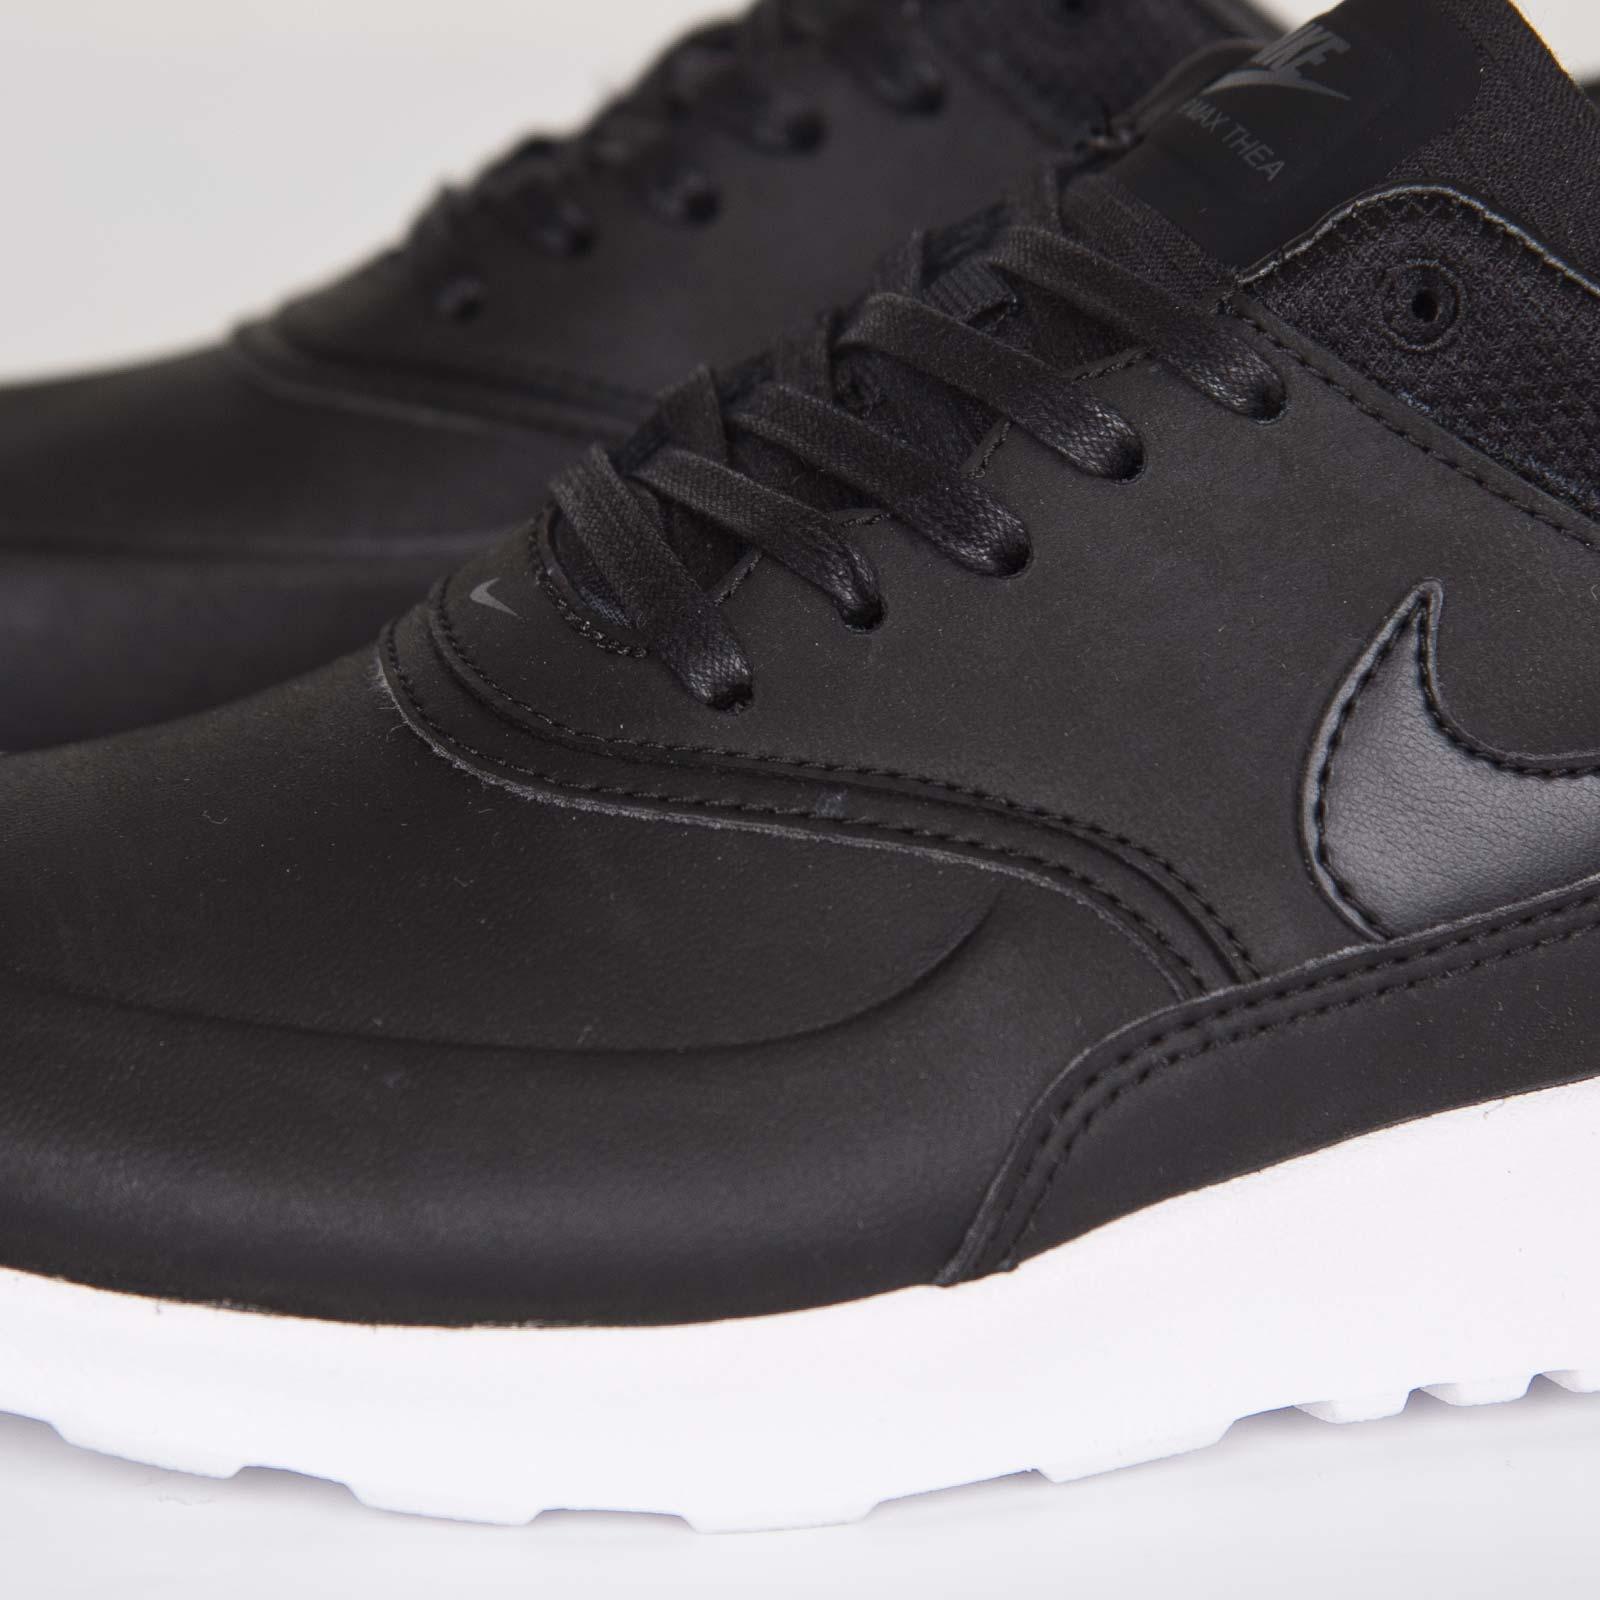 4b8abd3b11 Nike Wmns Air Max Thea Premium - 616723-007 - Sneakersnstuff | sneakers &  streetwear online since 1999